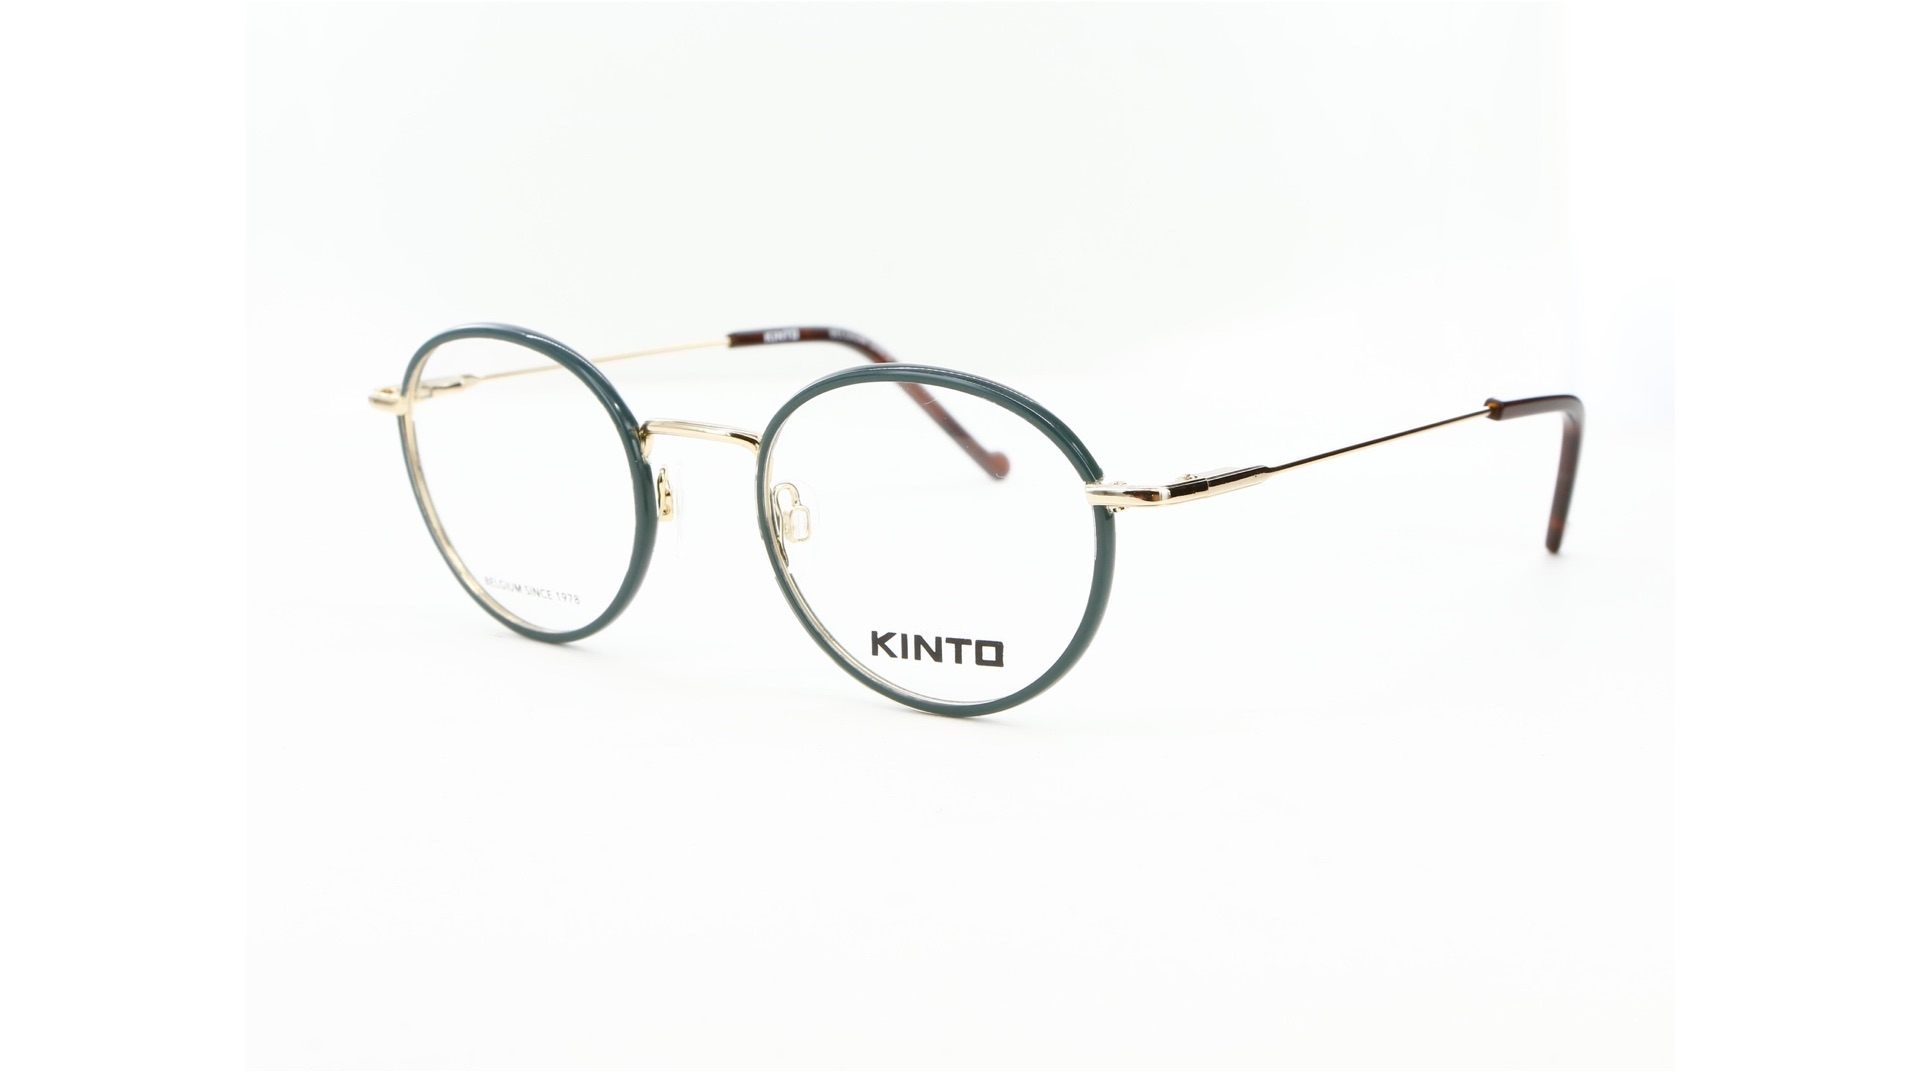 Kinto - ref: 81516